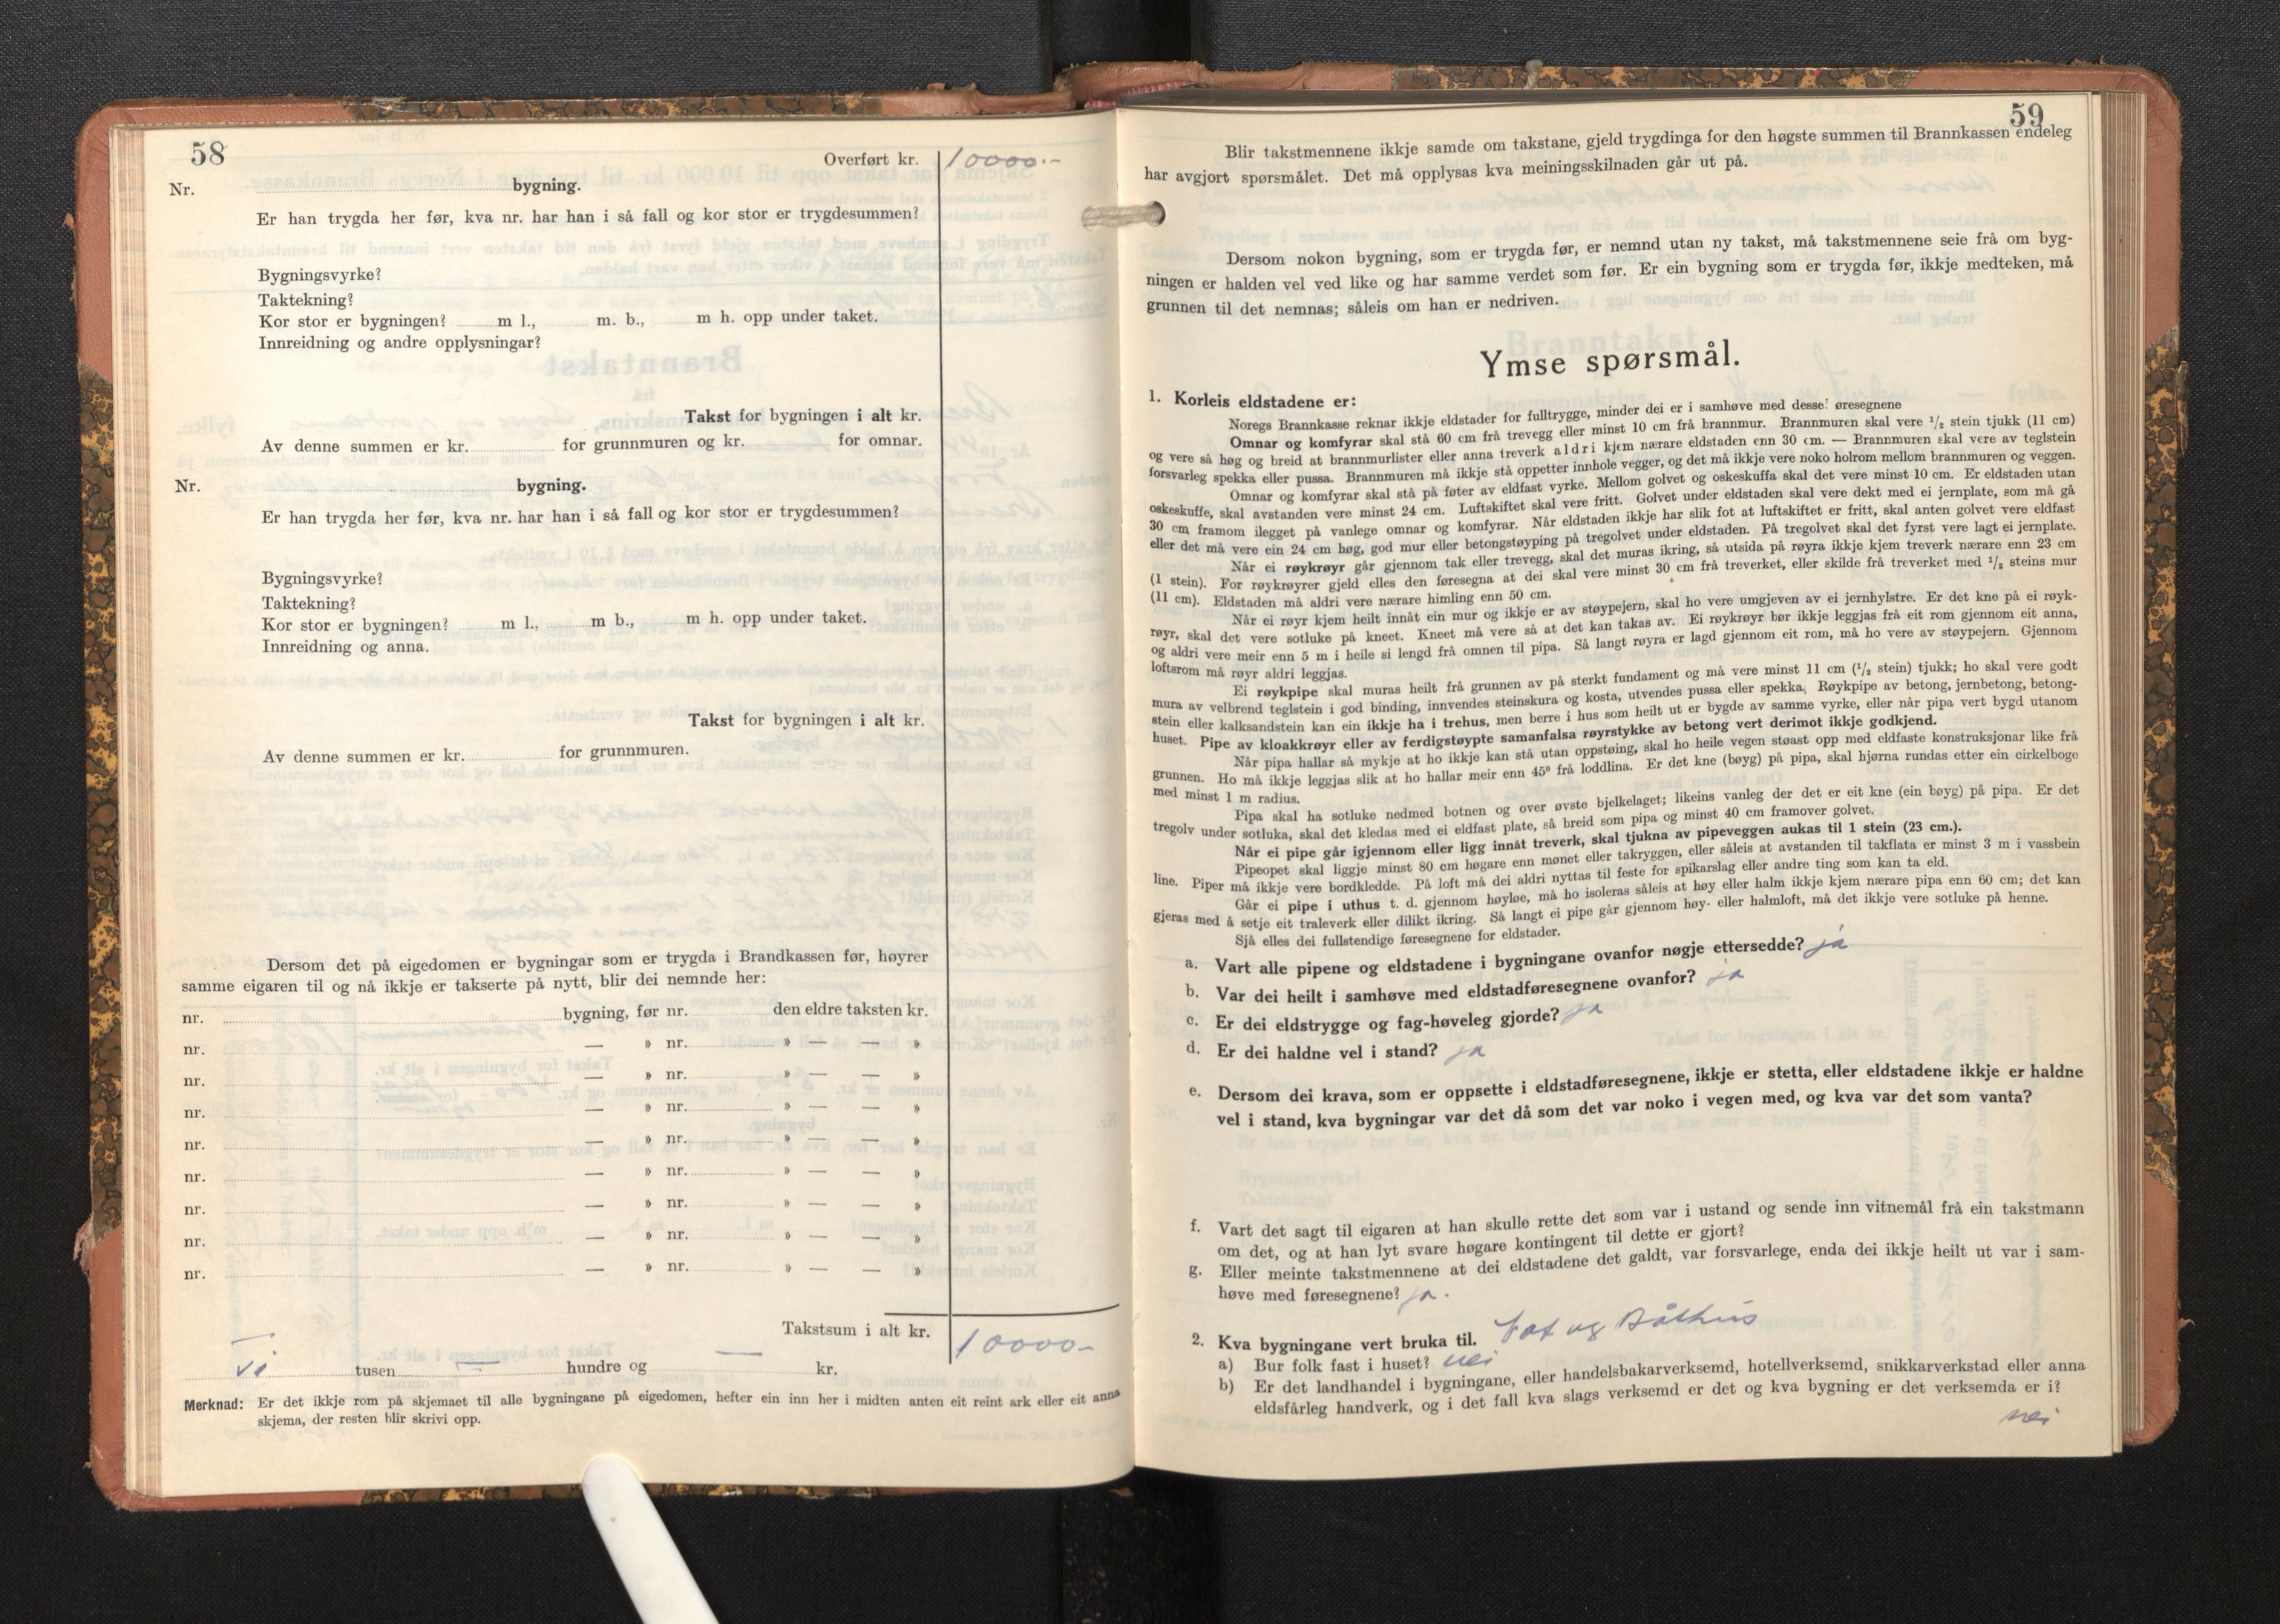 SAB, Lensmannen i Bremanger, 0012/L0009: Branntakstprotokoll, skjematakst, 1943-1950, p. 58-59